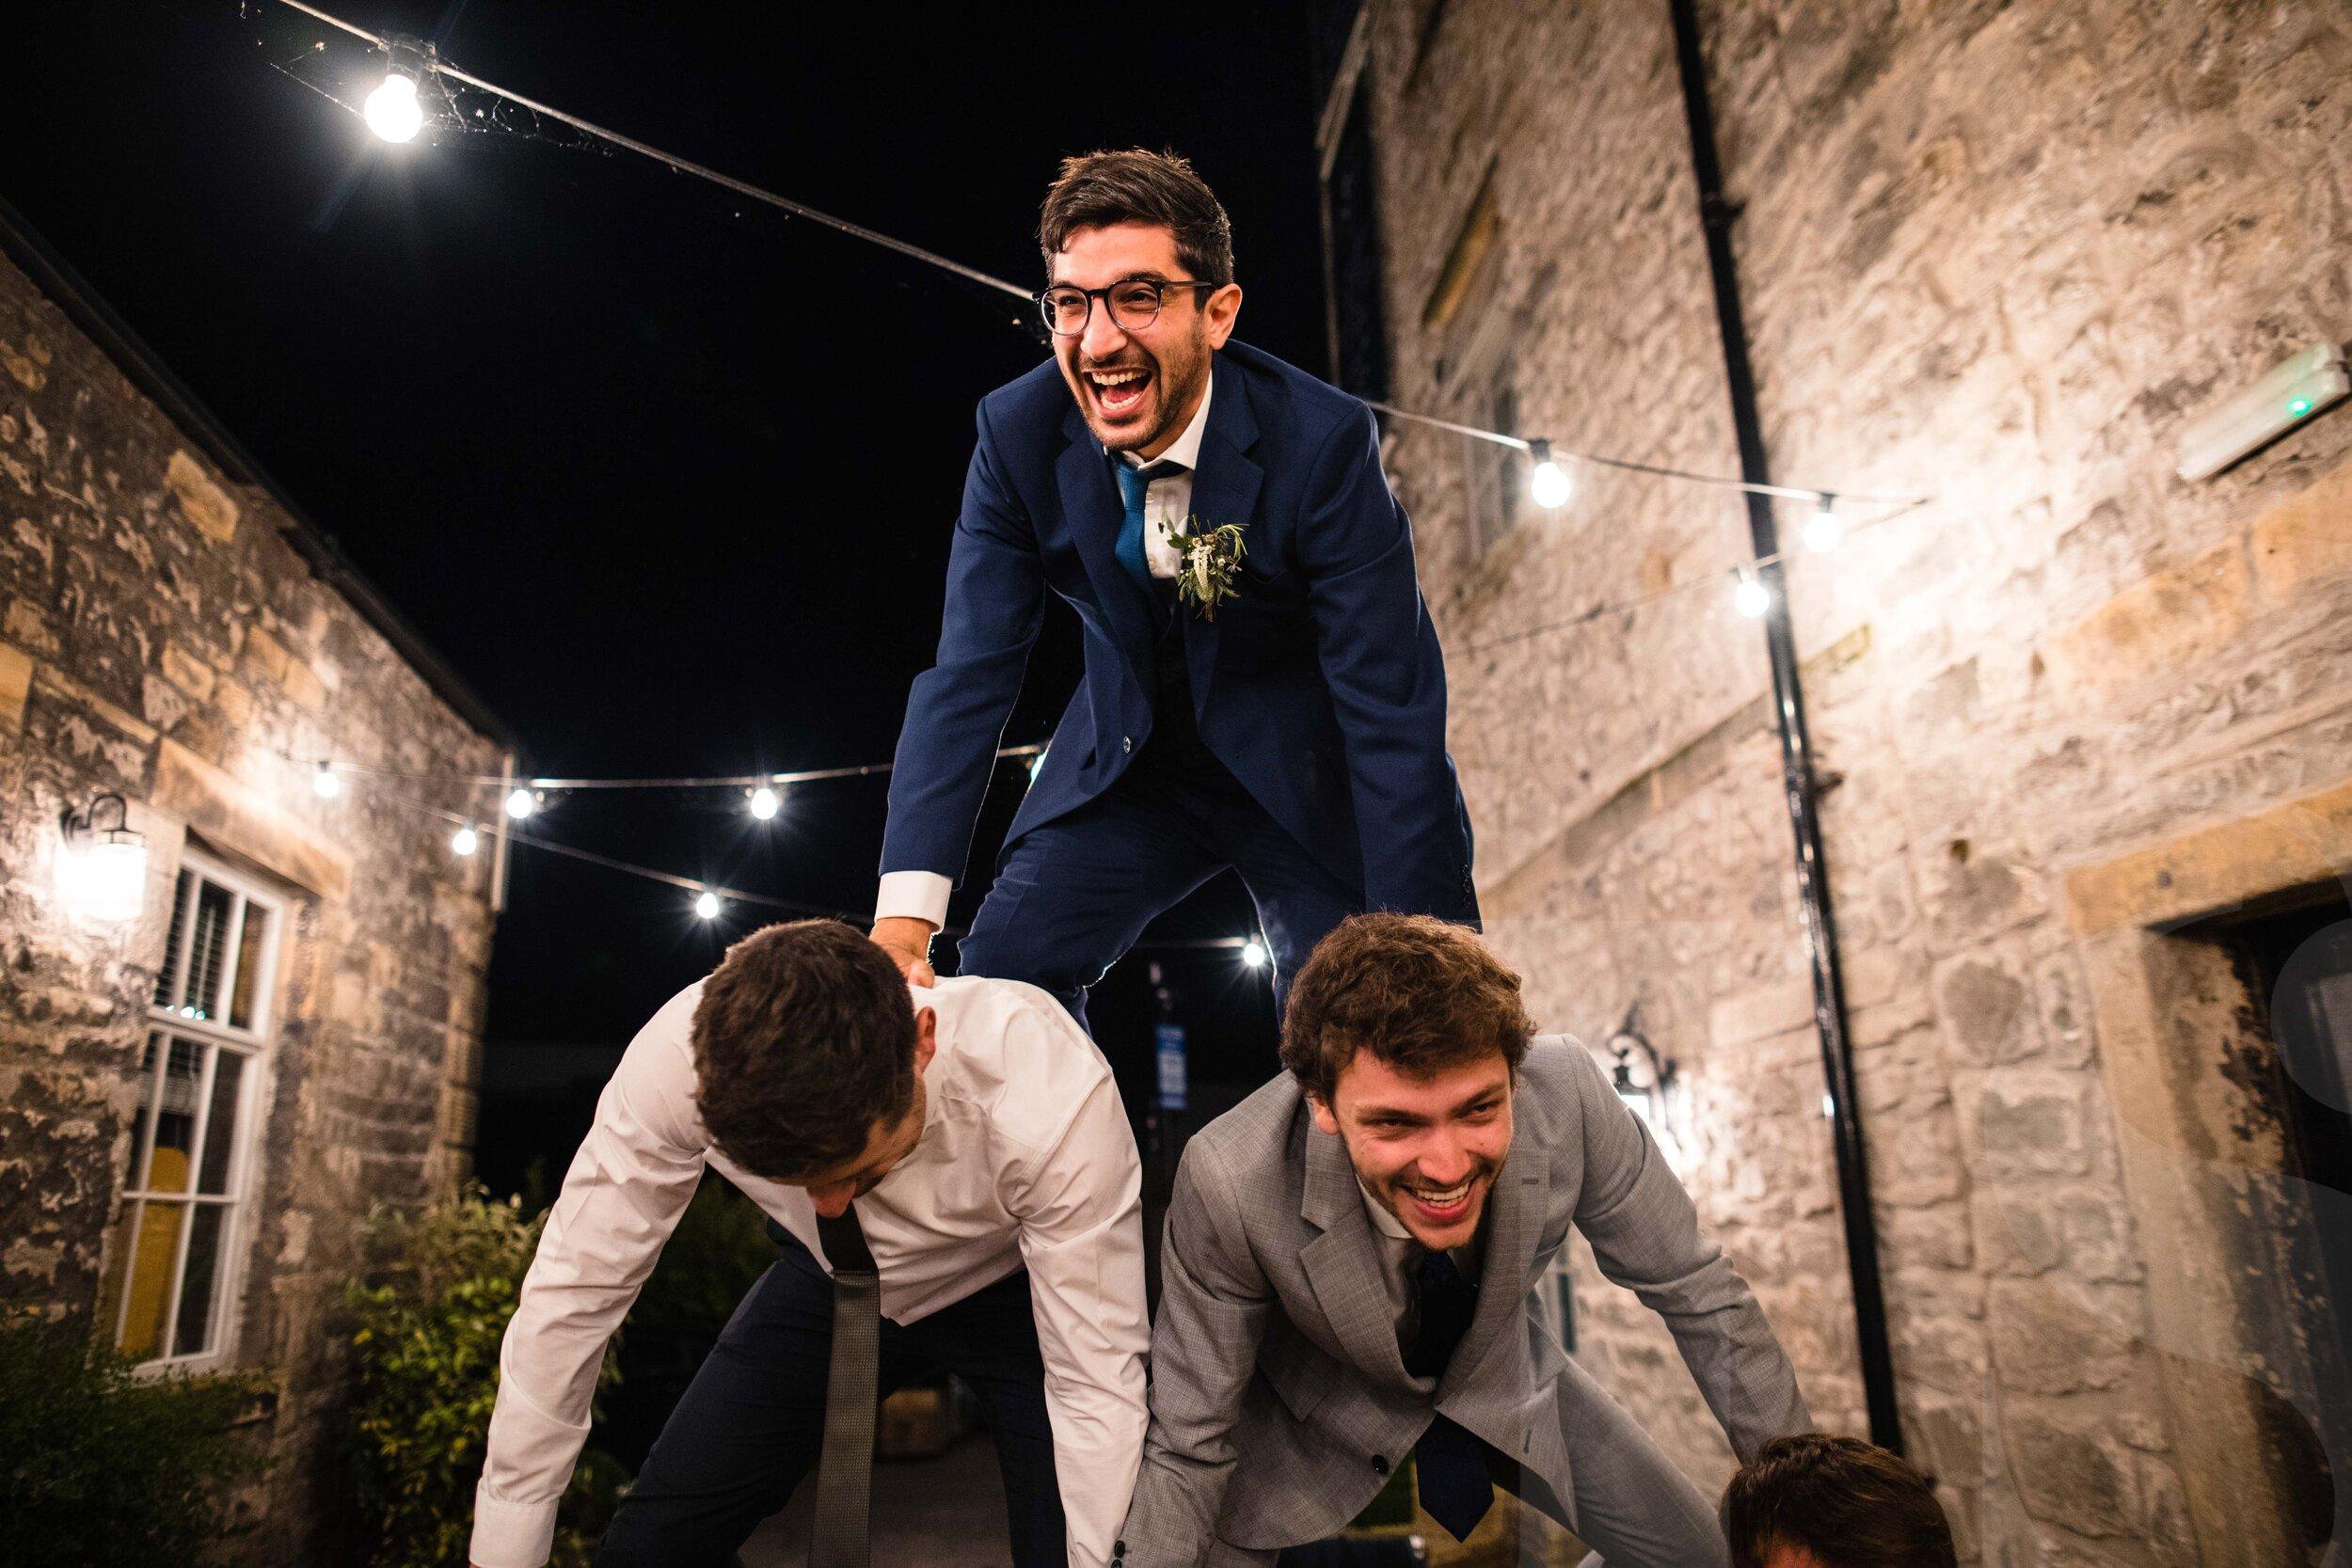 holmes-mill-clitheroe-wedding-photography-4.jpg